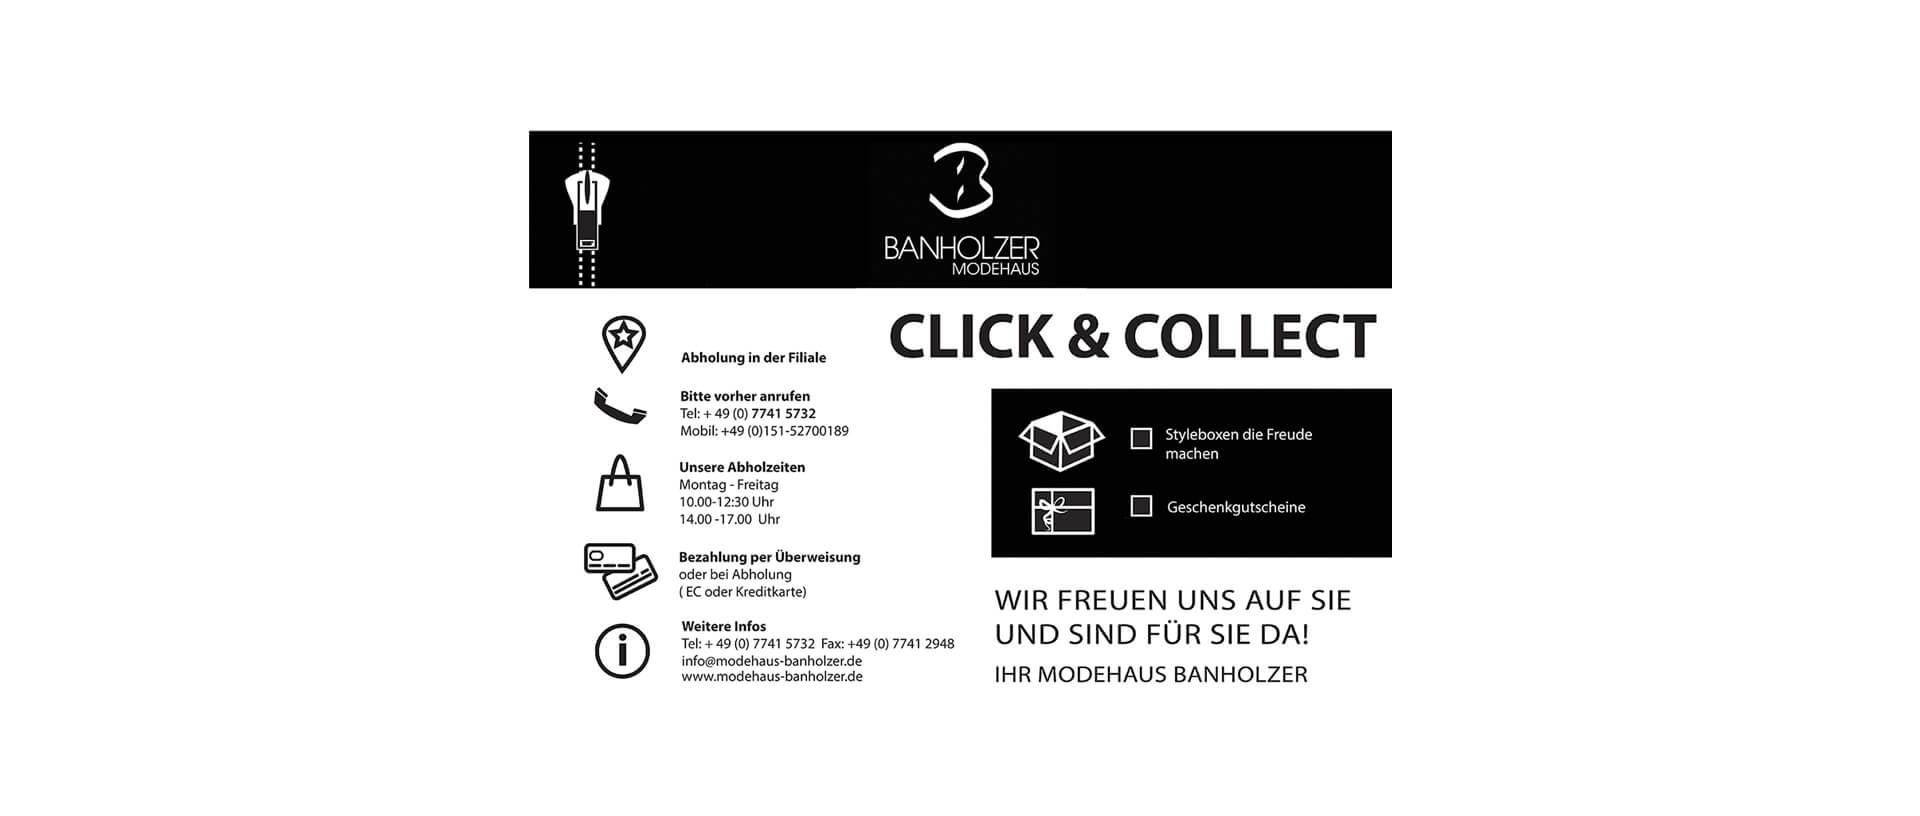 Click & Collect - Modehaus Banholzer